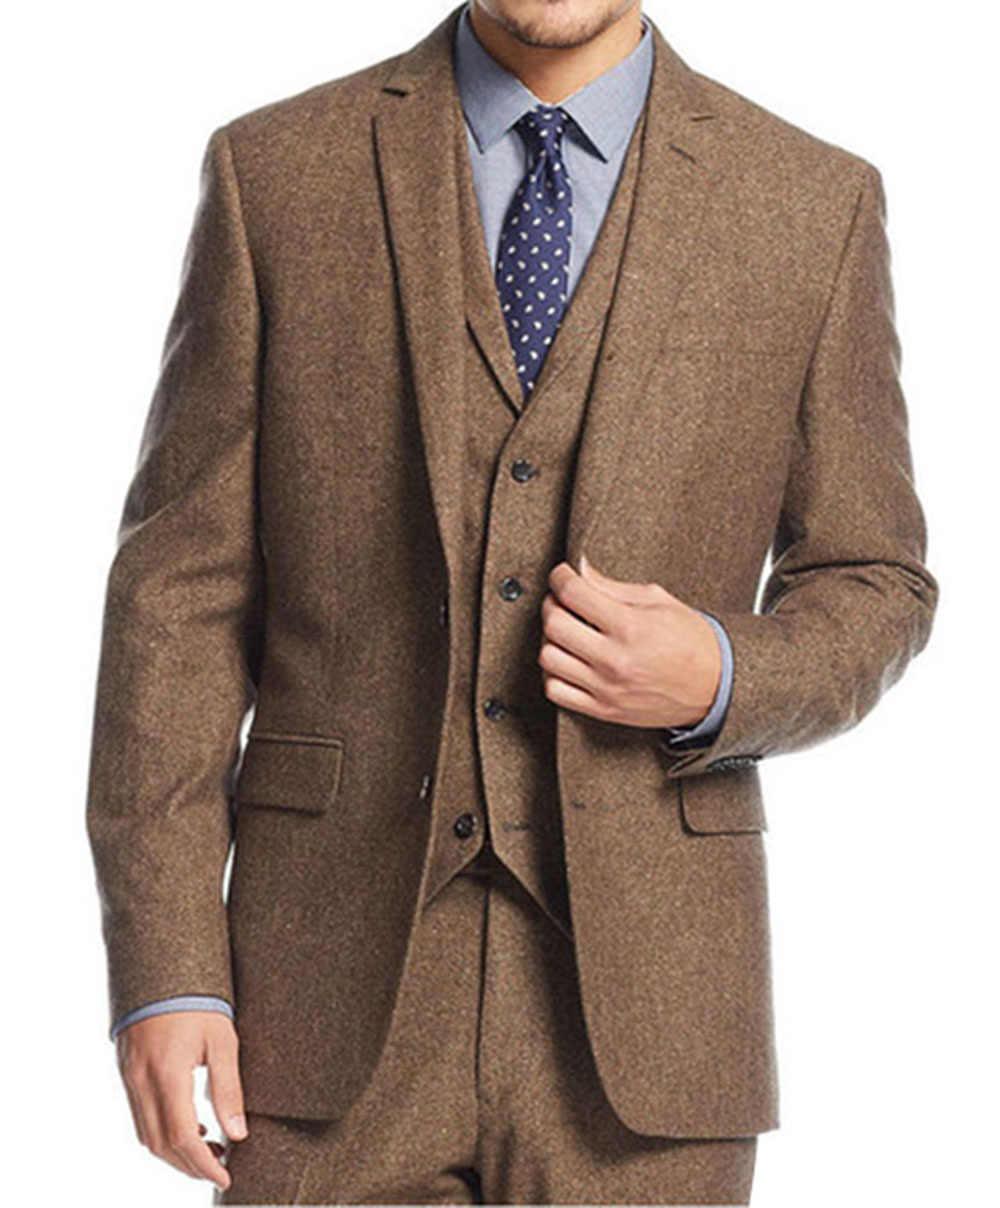 Nieuwe Bruin Tweed 3 Stuks Mannen Suits Fashion Formele Zakelijke Mannen Pak Set Custom Prom Bruidegom Trouwjurk (Blazer + Vest + Broek)